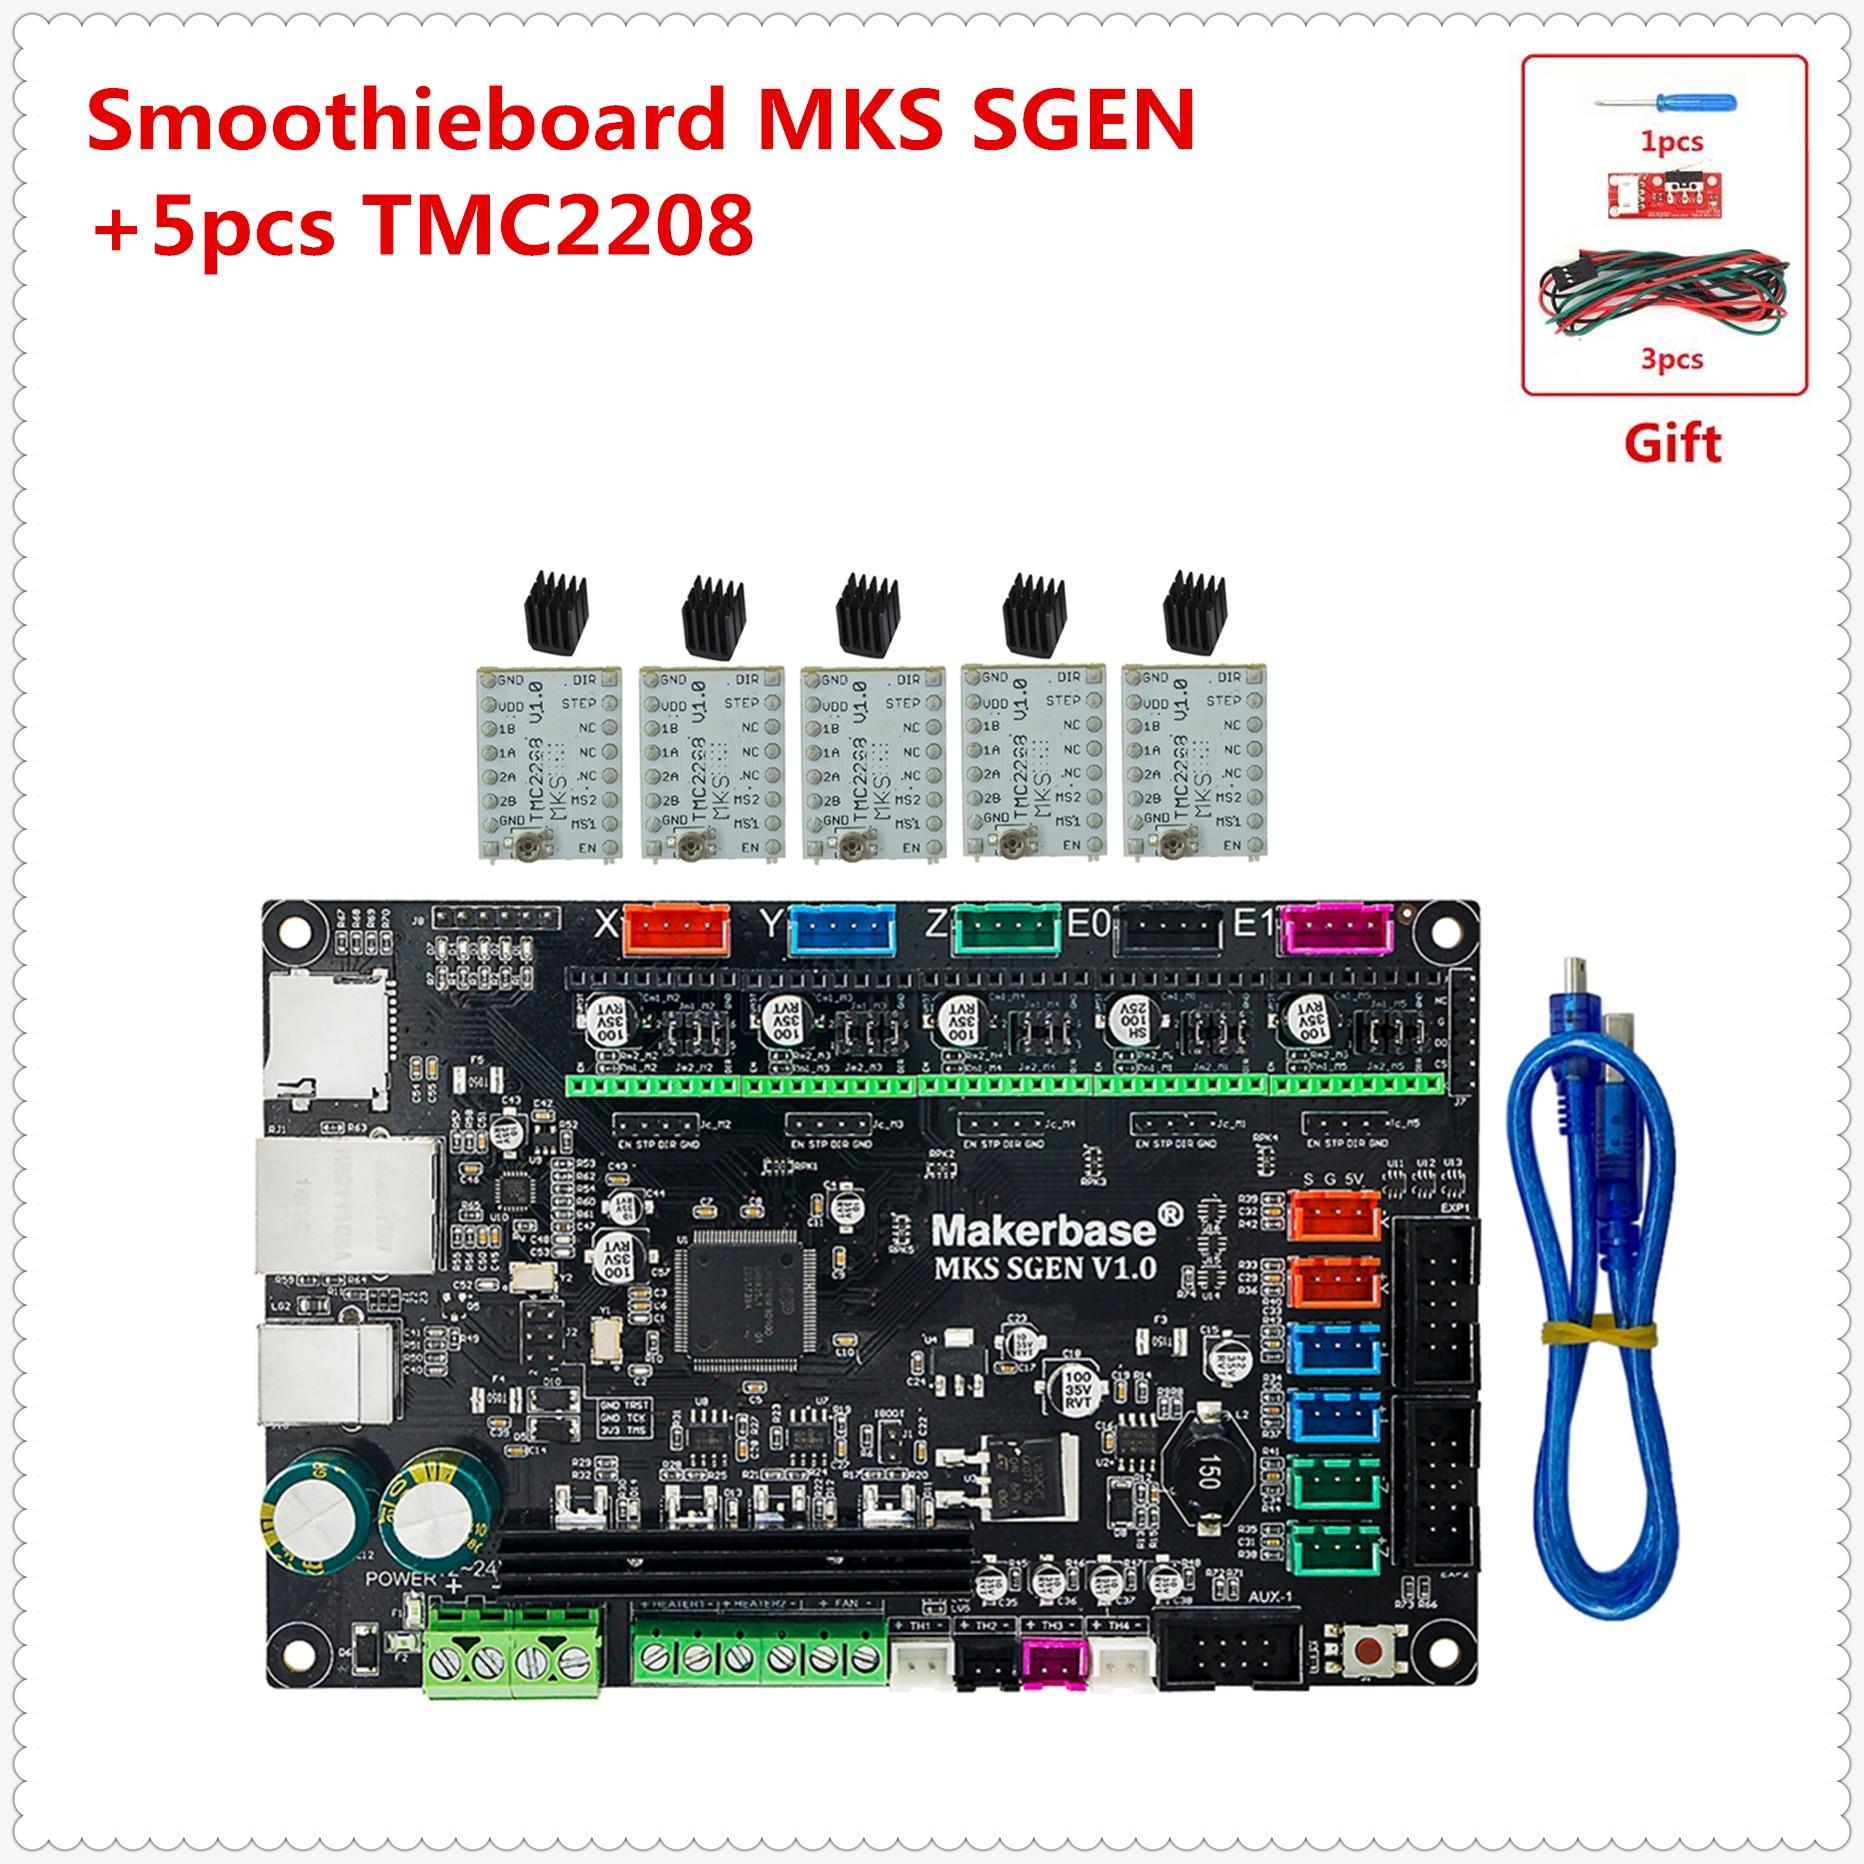 3d printer board MKS SGEN Smoothieboard support TMC2208 TMC2100 LV8729  DRV8825 A4988 tb6600 lv8727 stepper motor driver